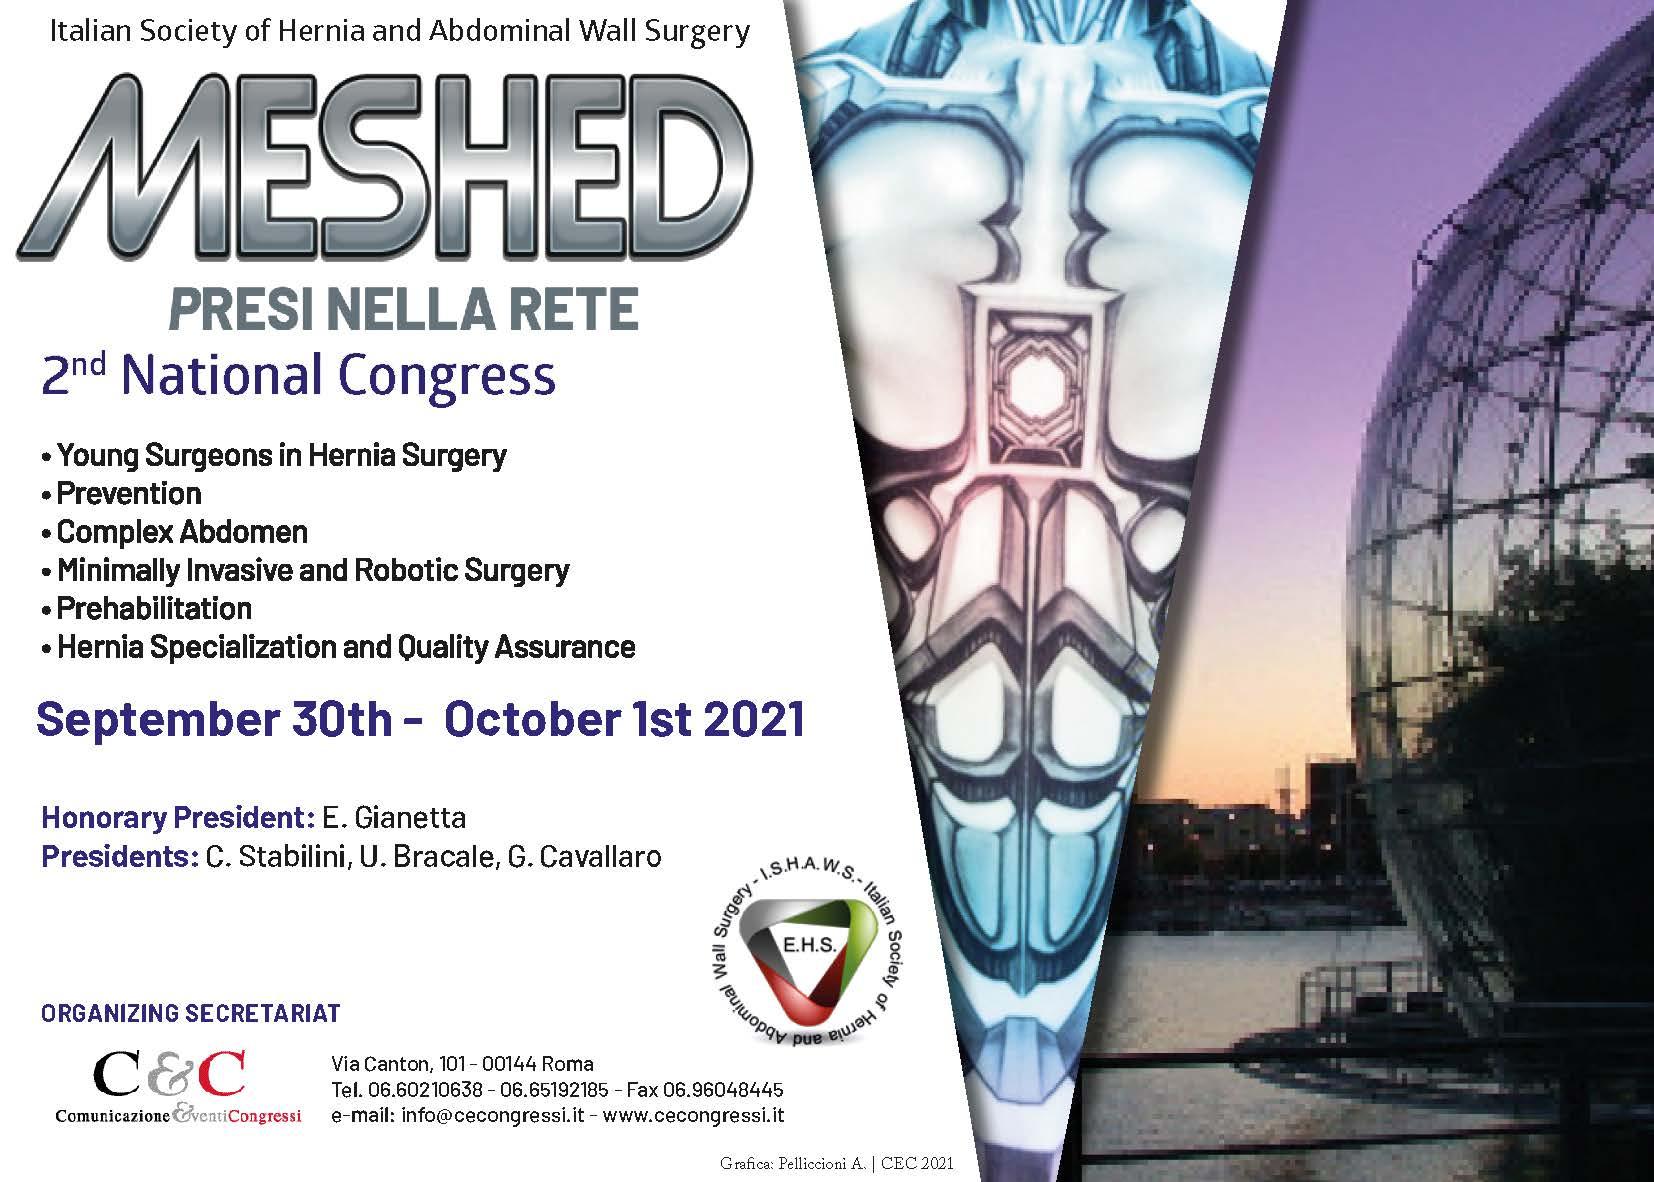 MESHED - PRESI NELLA RETE  | SEPTEMBER 30TH - OCTOBER 1ST 2021